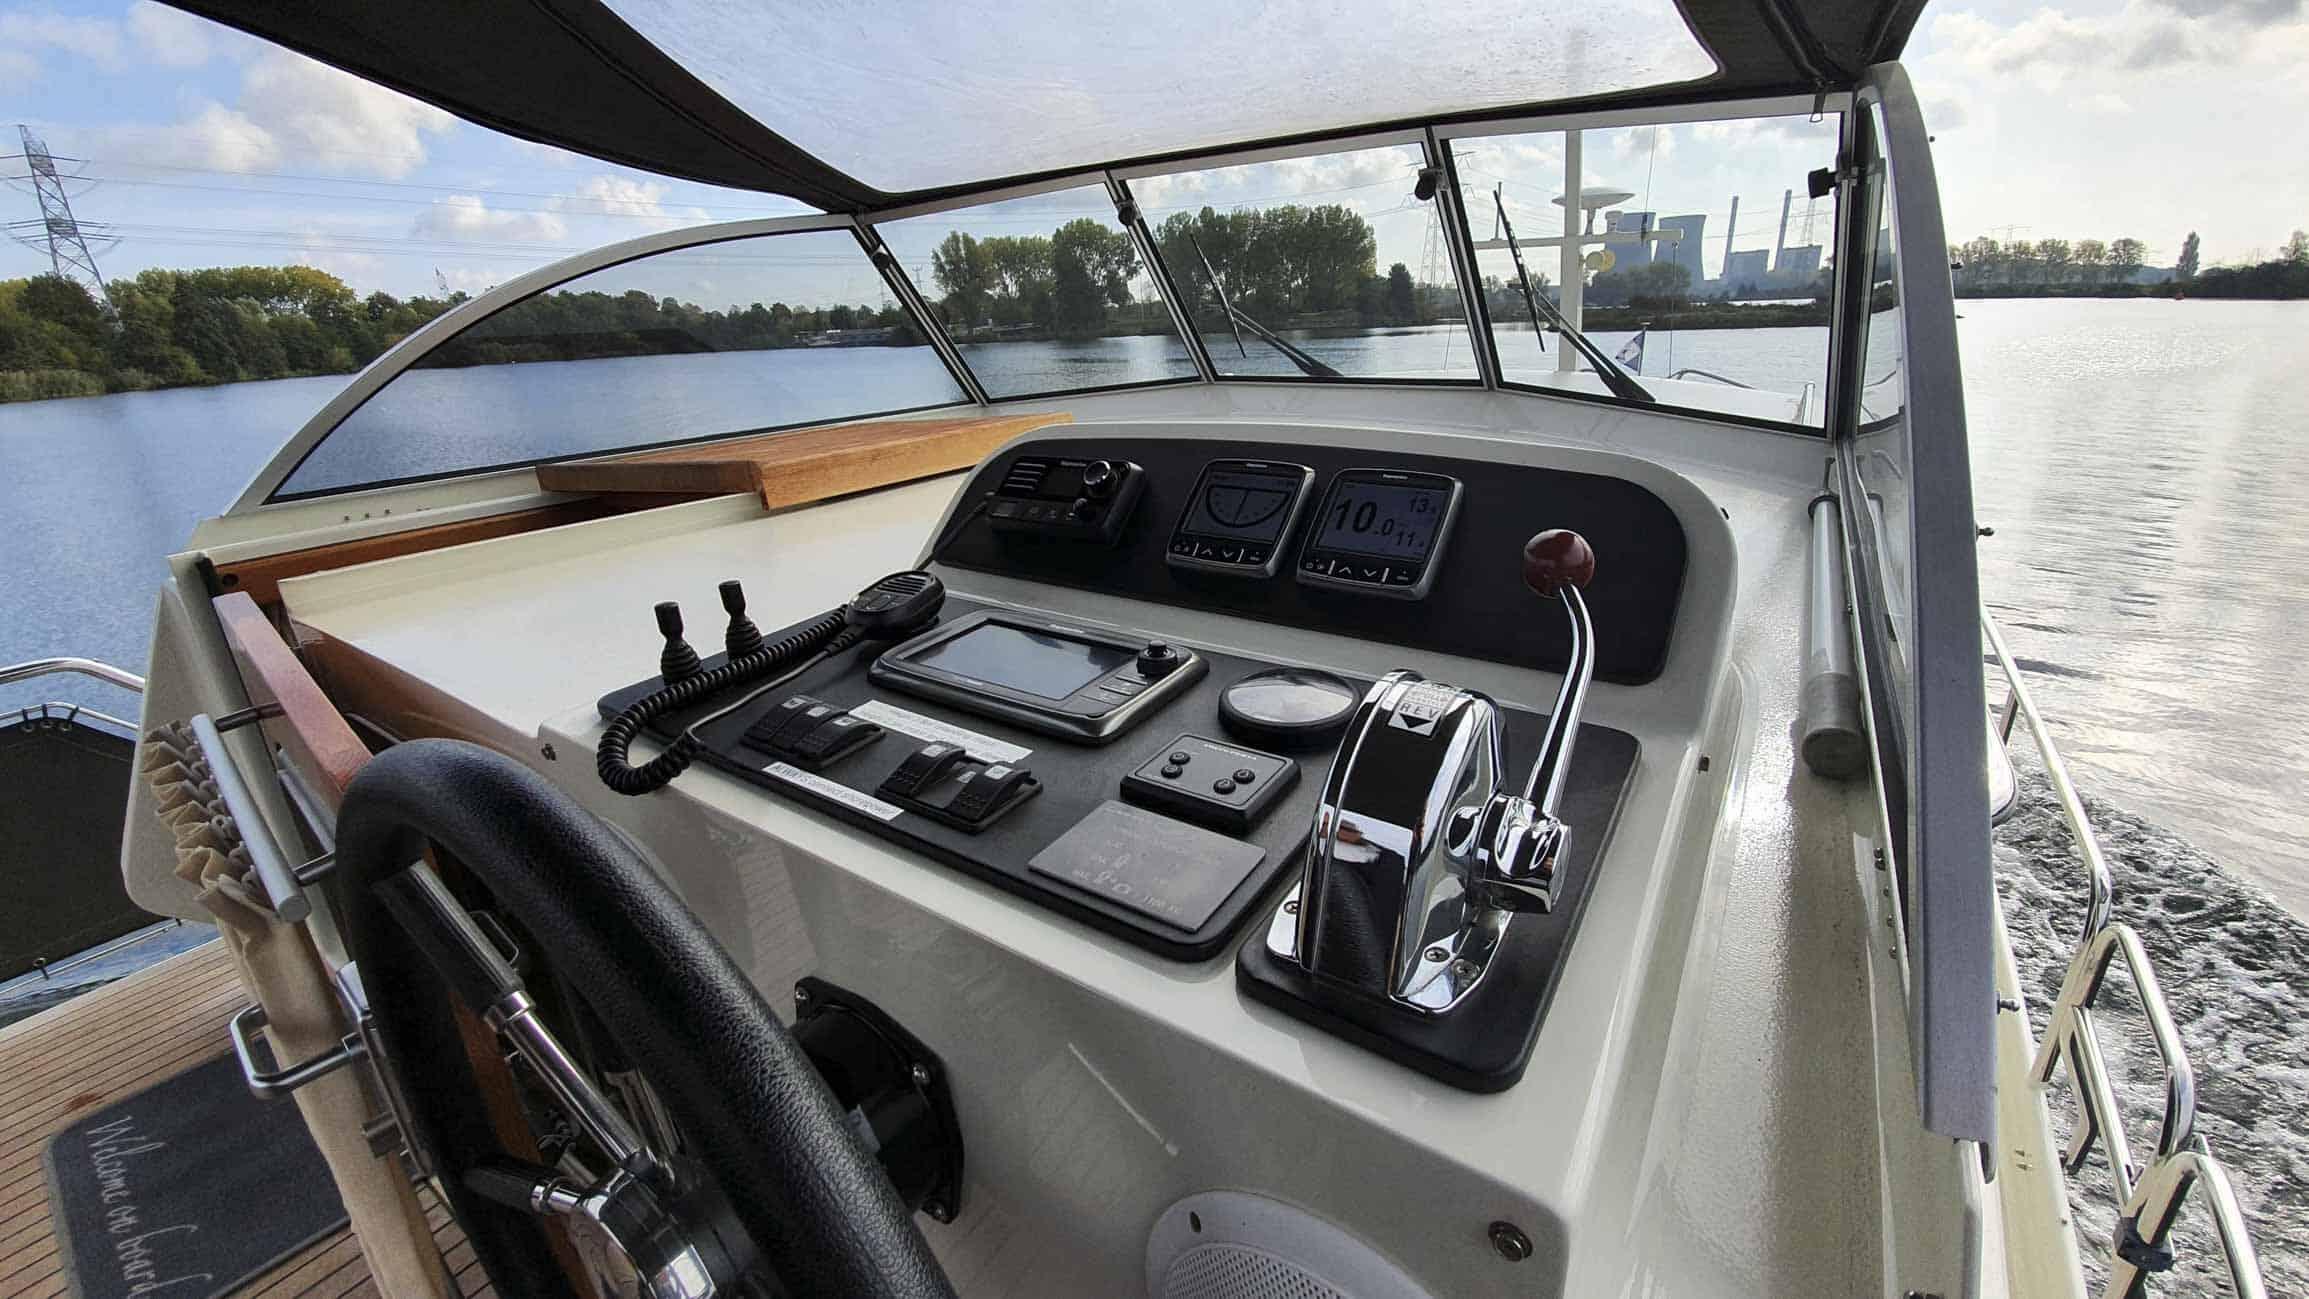 gebruikt-motorjacht-grand-sturdy-34-9-ac-3115-022